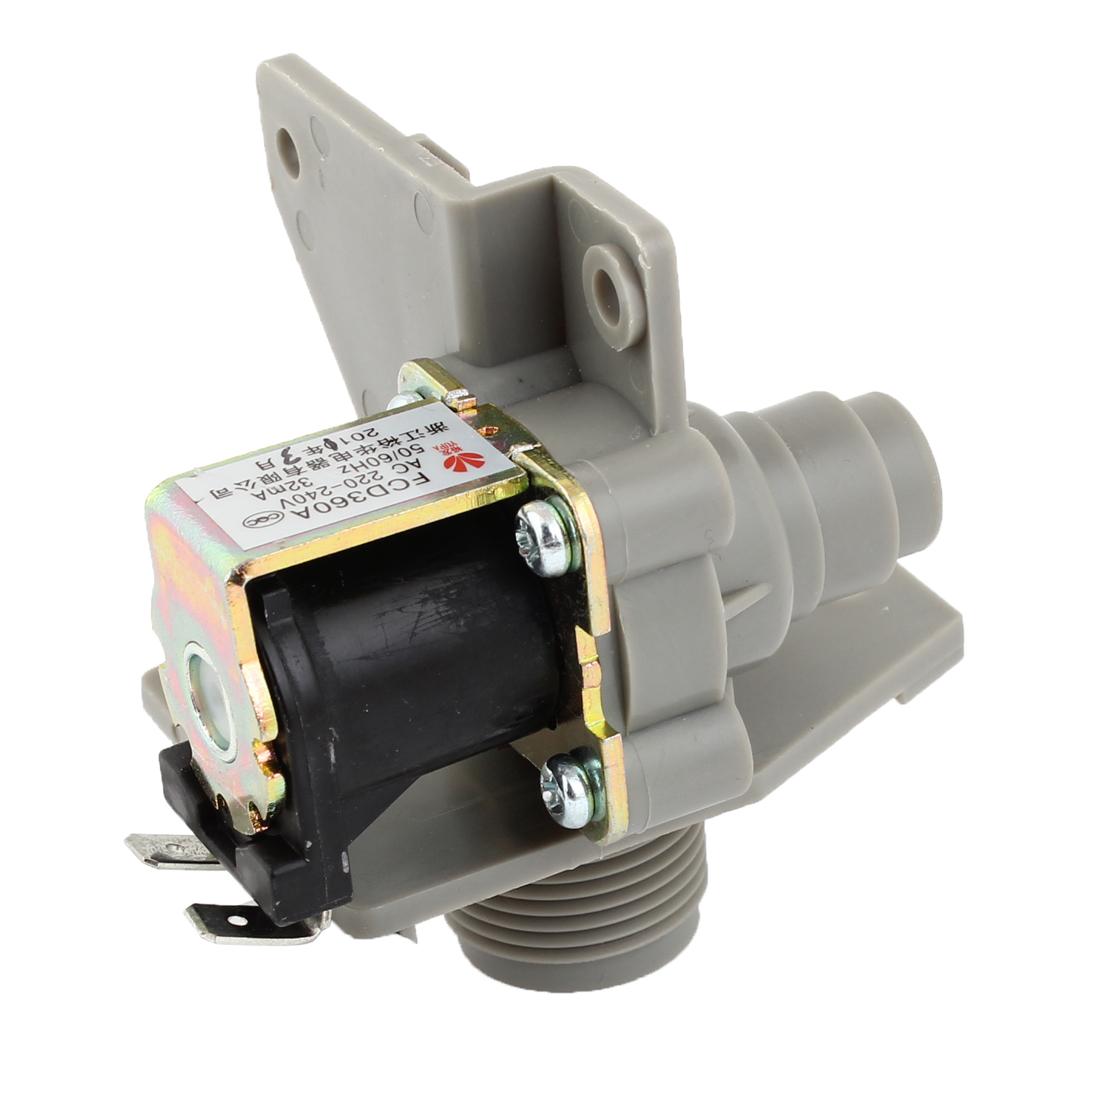 AC 220/240V 26mm Male Thread Washer Washing Machine Water Inlet Solenoid Valve